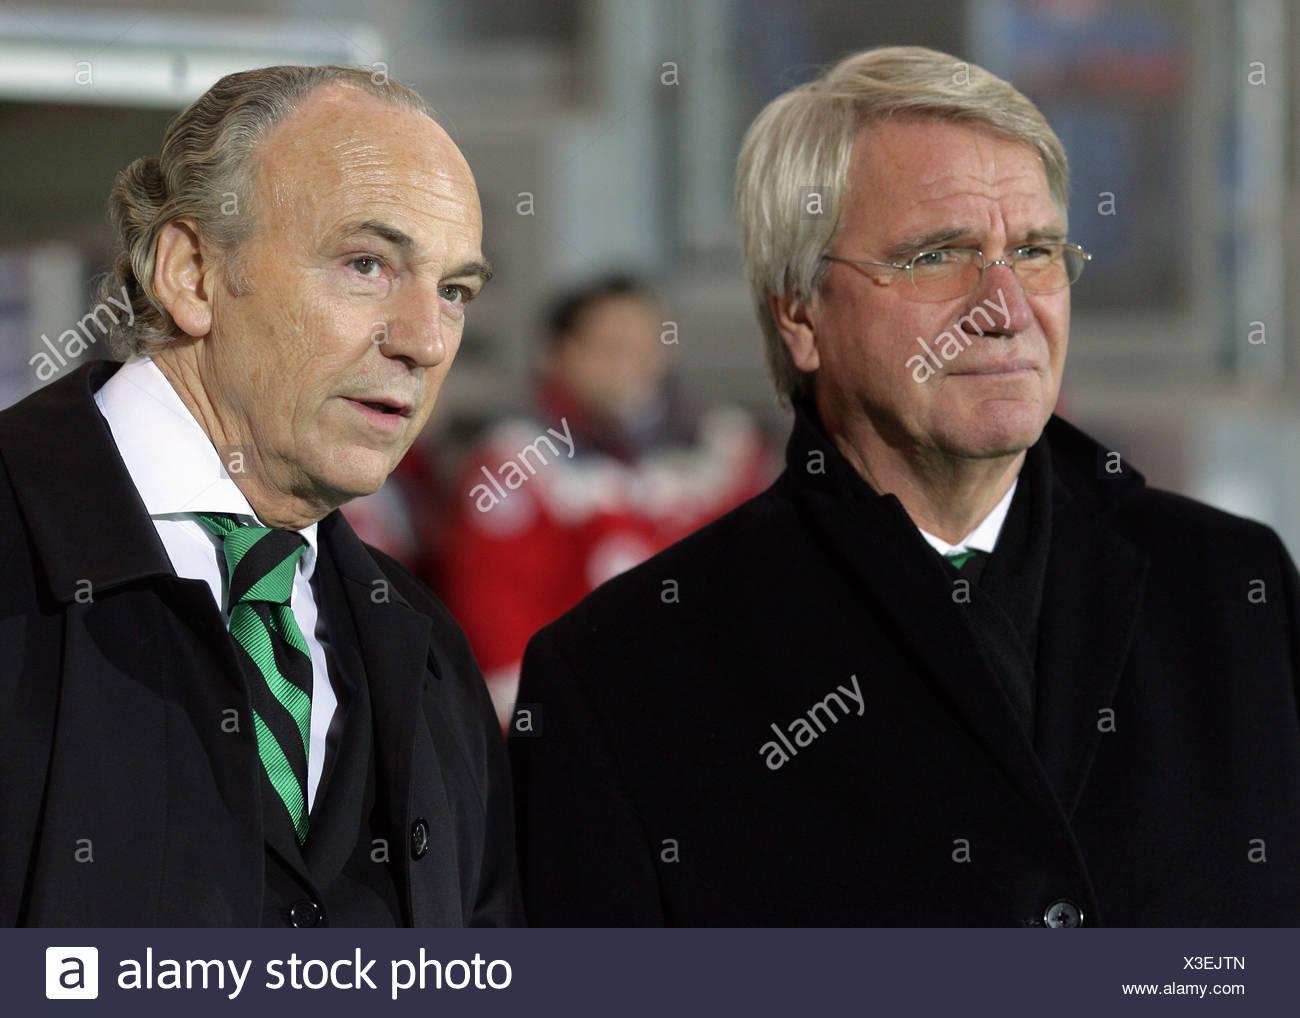 President of the german soccer club Borrussia Moenchengladbach Rolf Koenigs (r.) and his Vice Siegfried Soellner (l.) Stock Photo